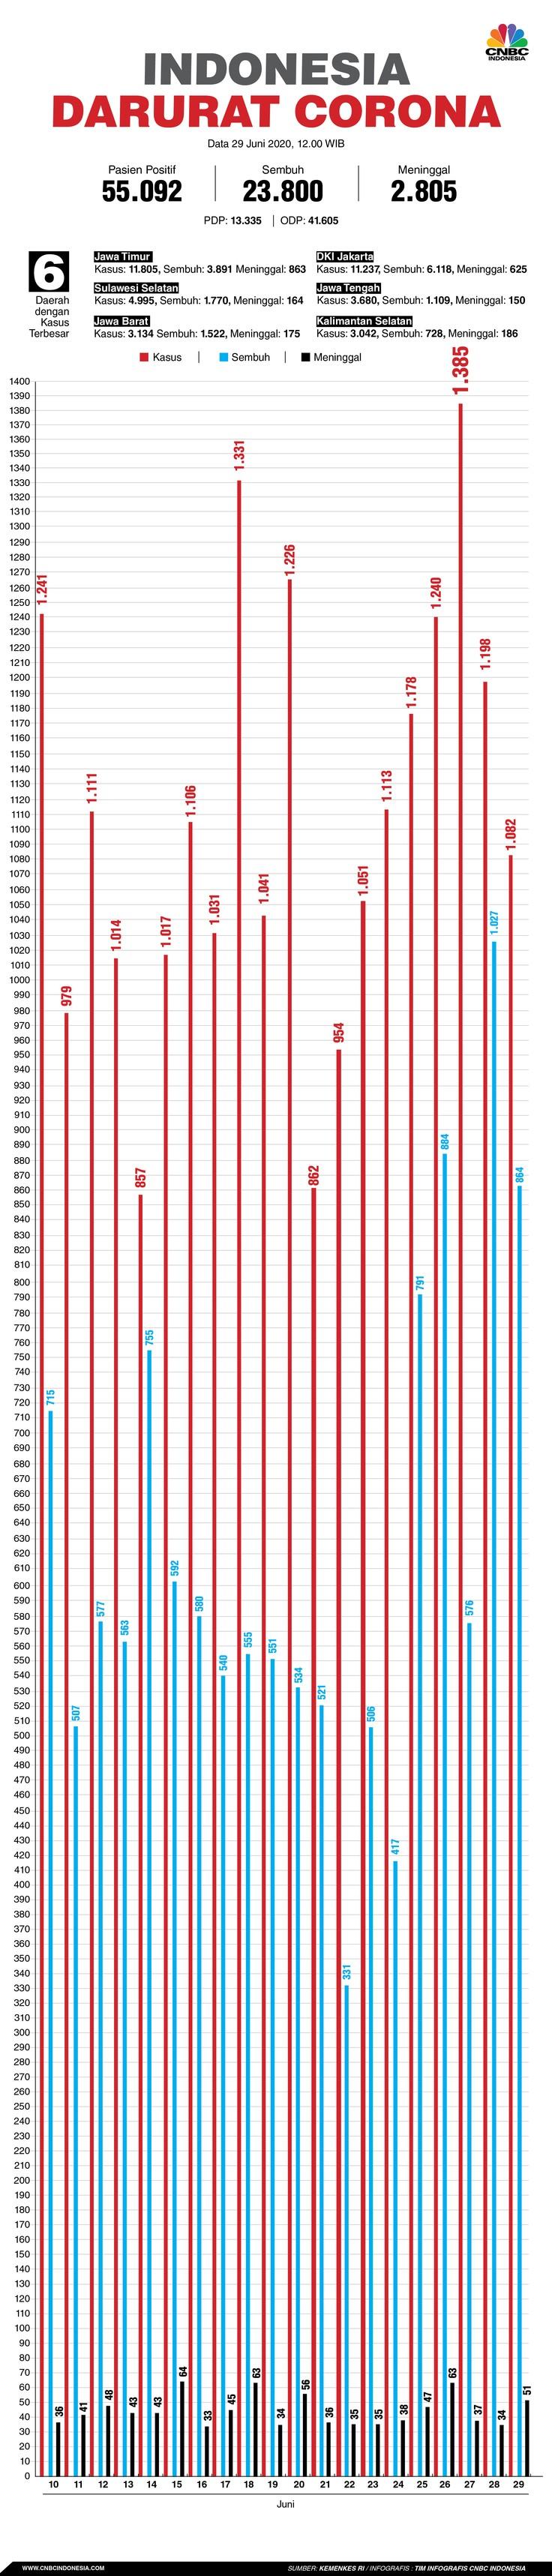 Infografis/Indonesia Darurat corona 29 Juni 2020/Aristya Rahadian